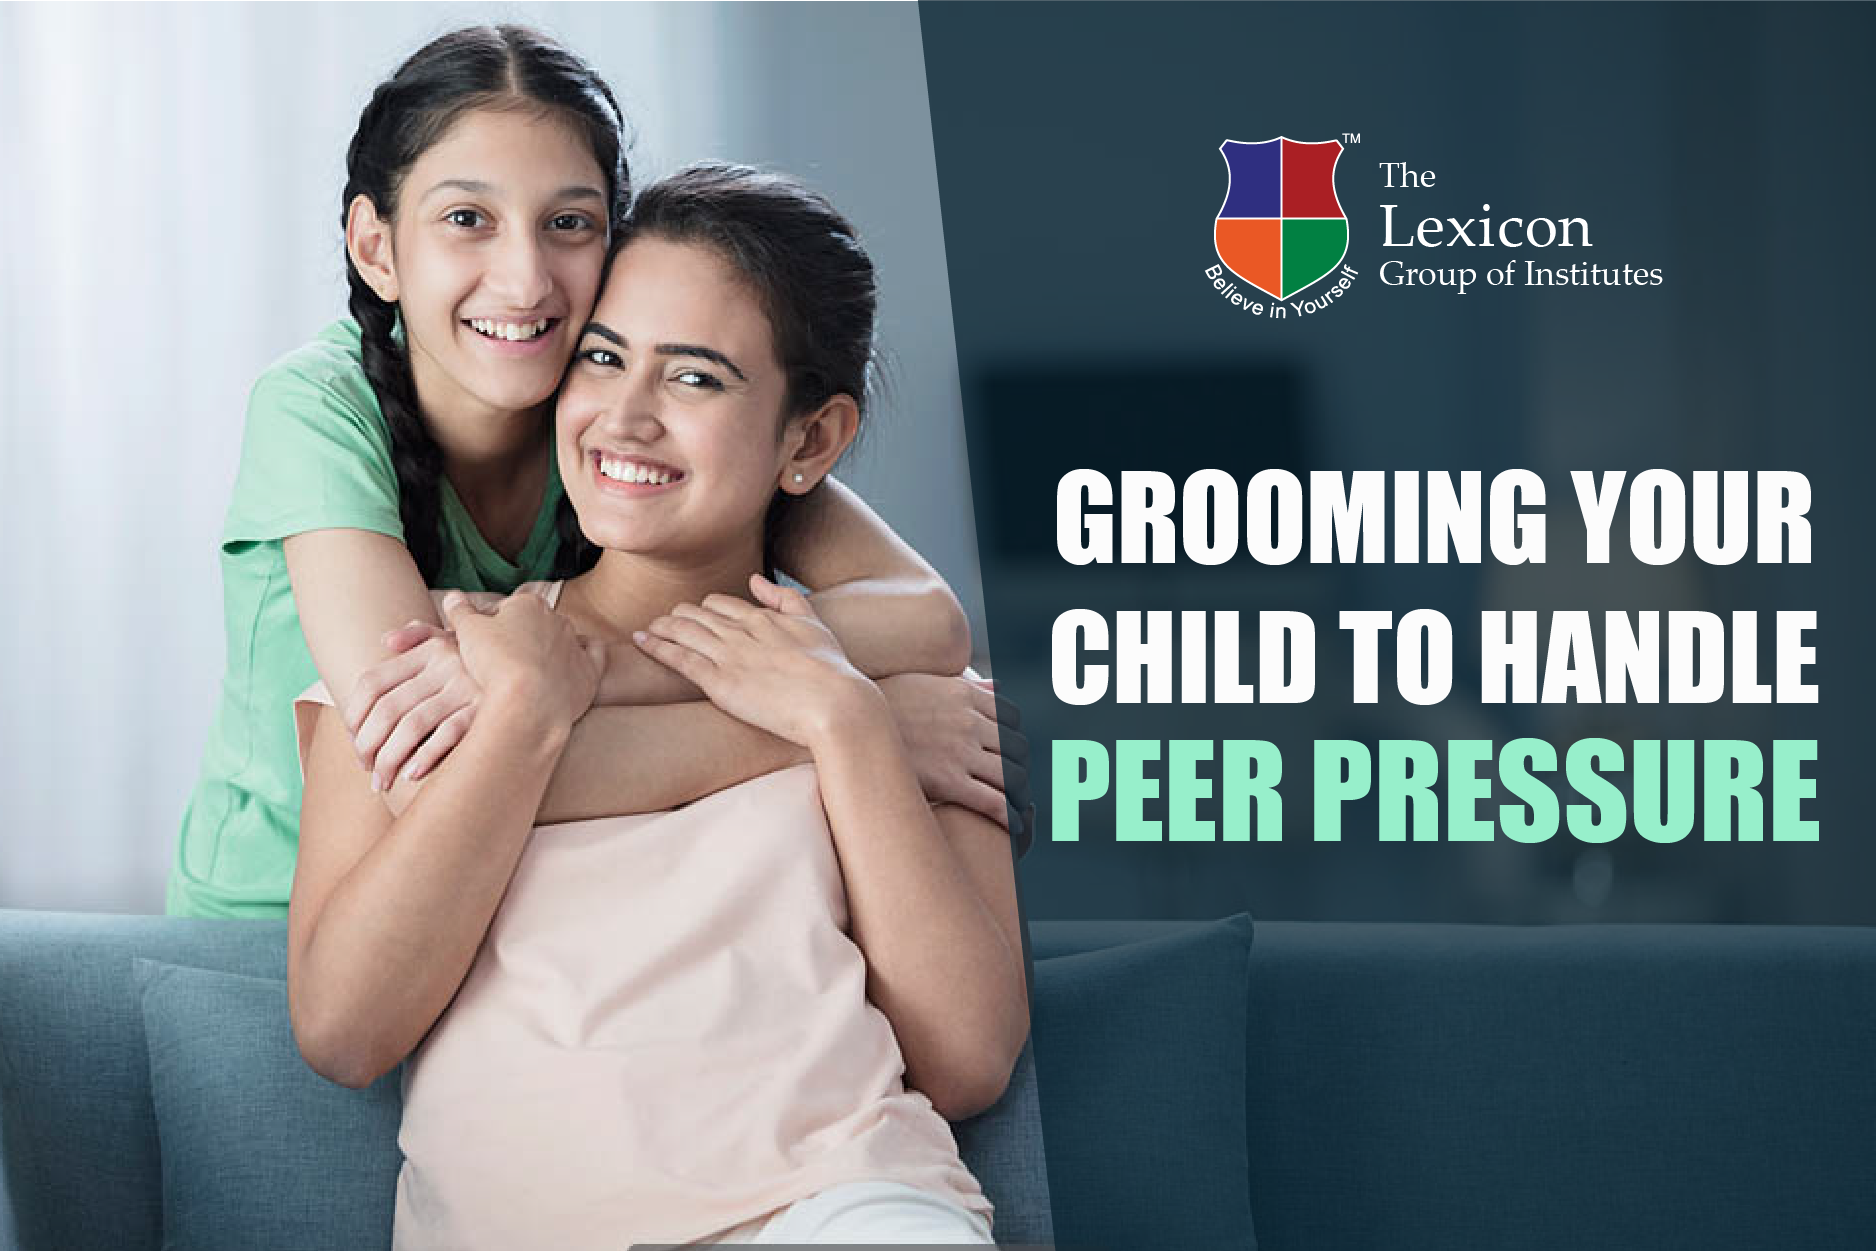 Grooming your Child to Handle Peer Pressure